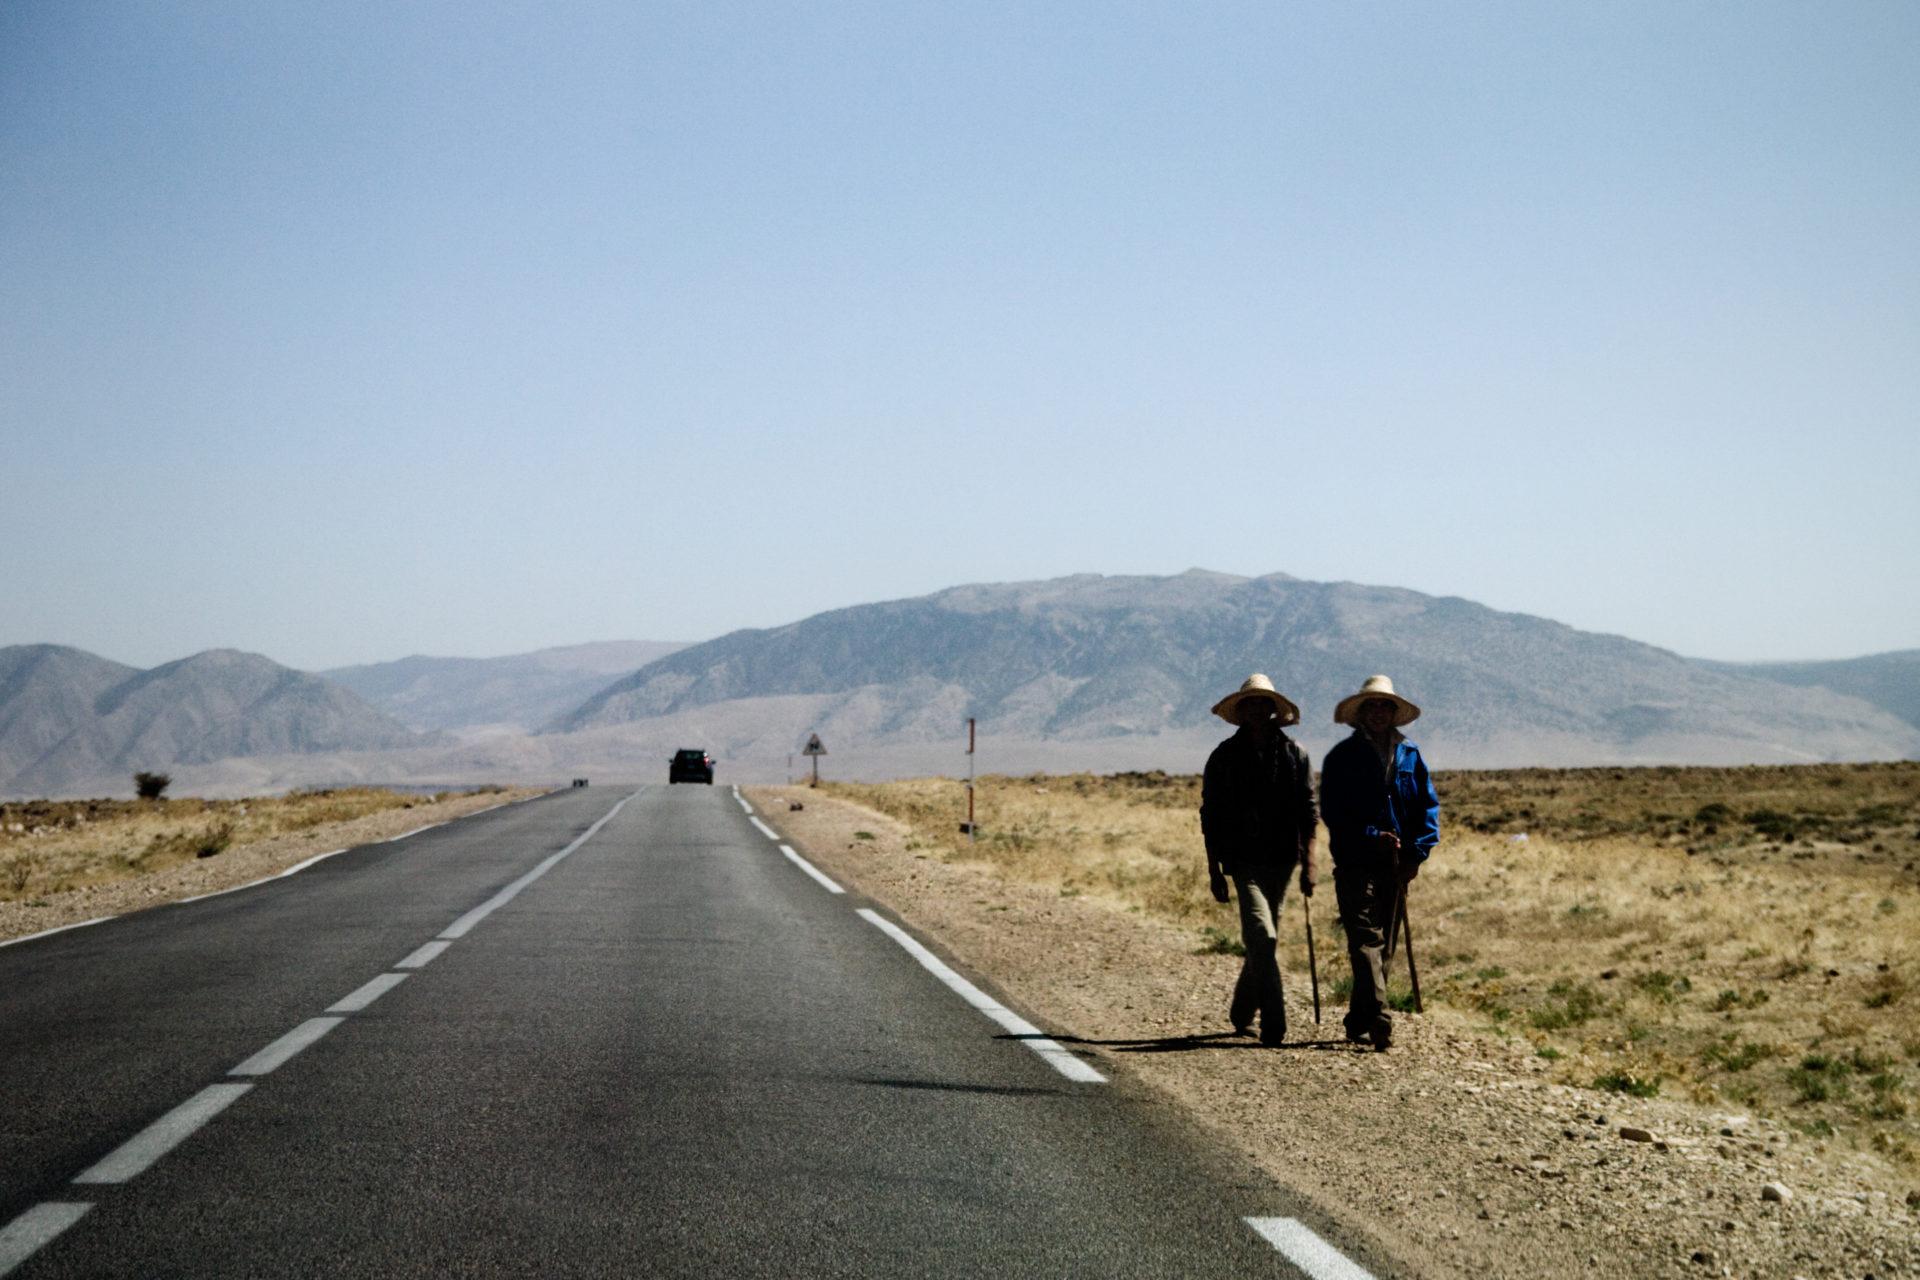 GIZ_Morocco_Desert_Culture_IGP1420_Carolin-Weinkopf